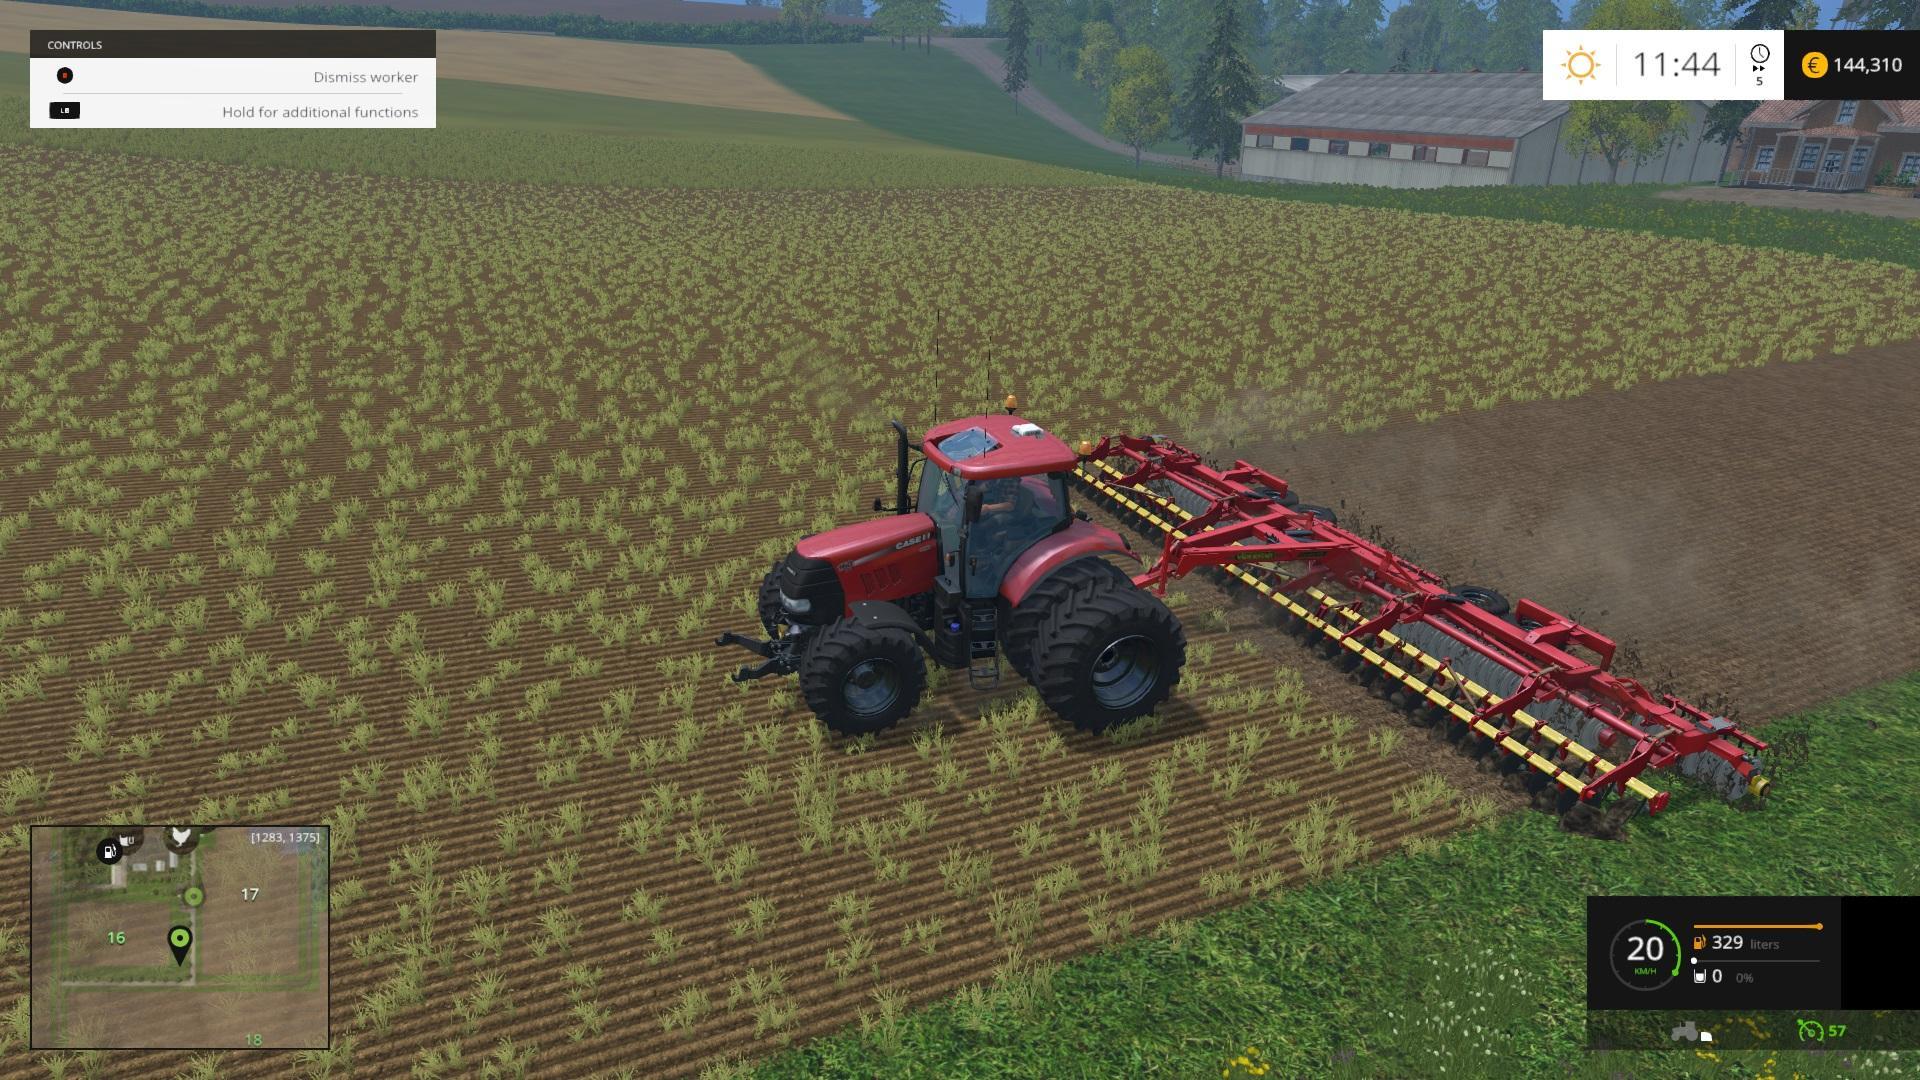 VAEDERSTAD CARRIER 820 WIDE V1 0 MOD - Farming simulator 2019 / 2017